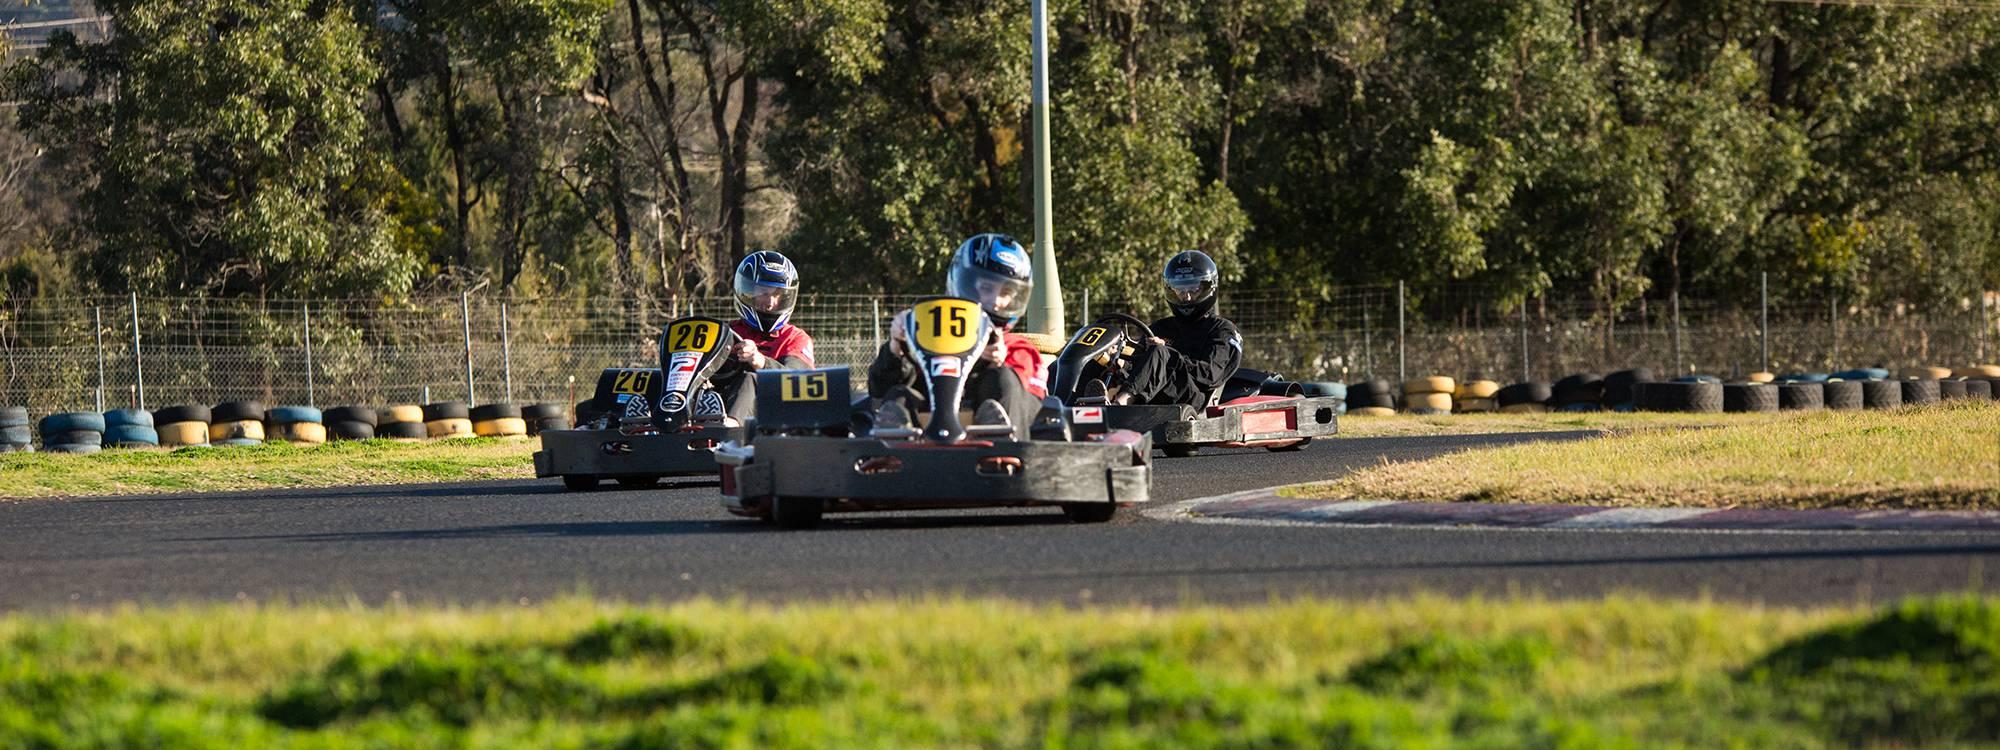 Go Karting Sydney | Race Hire Karts Campbelltown | Picton